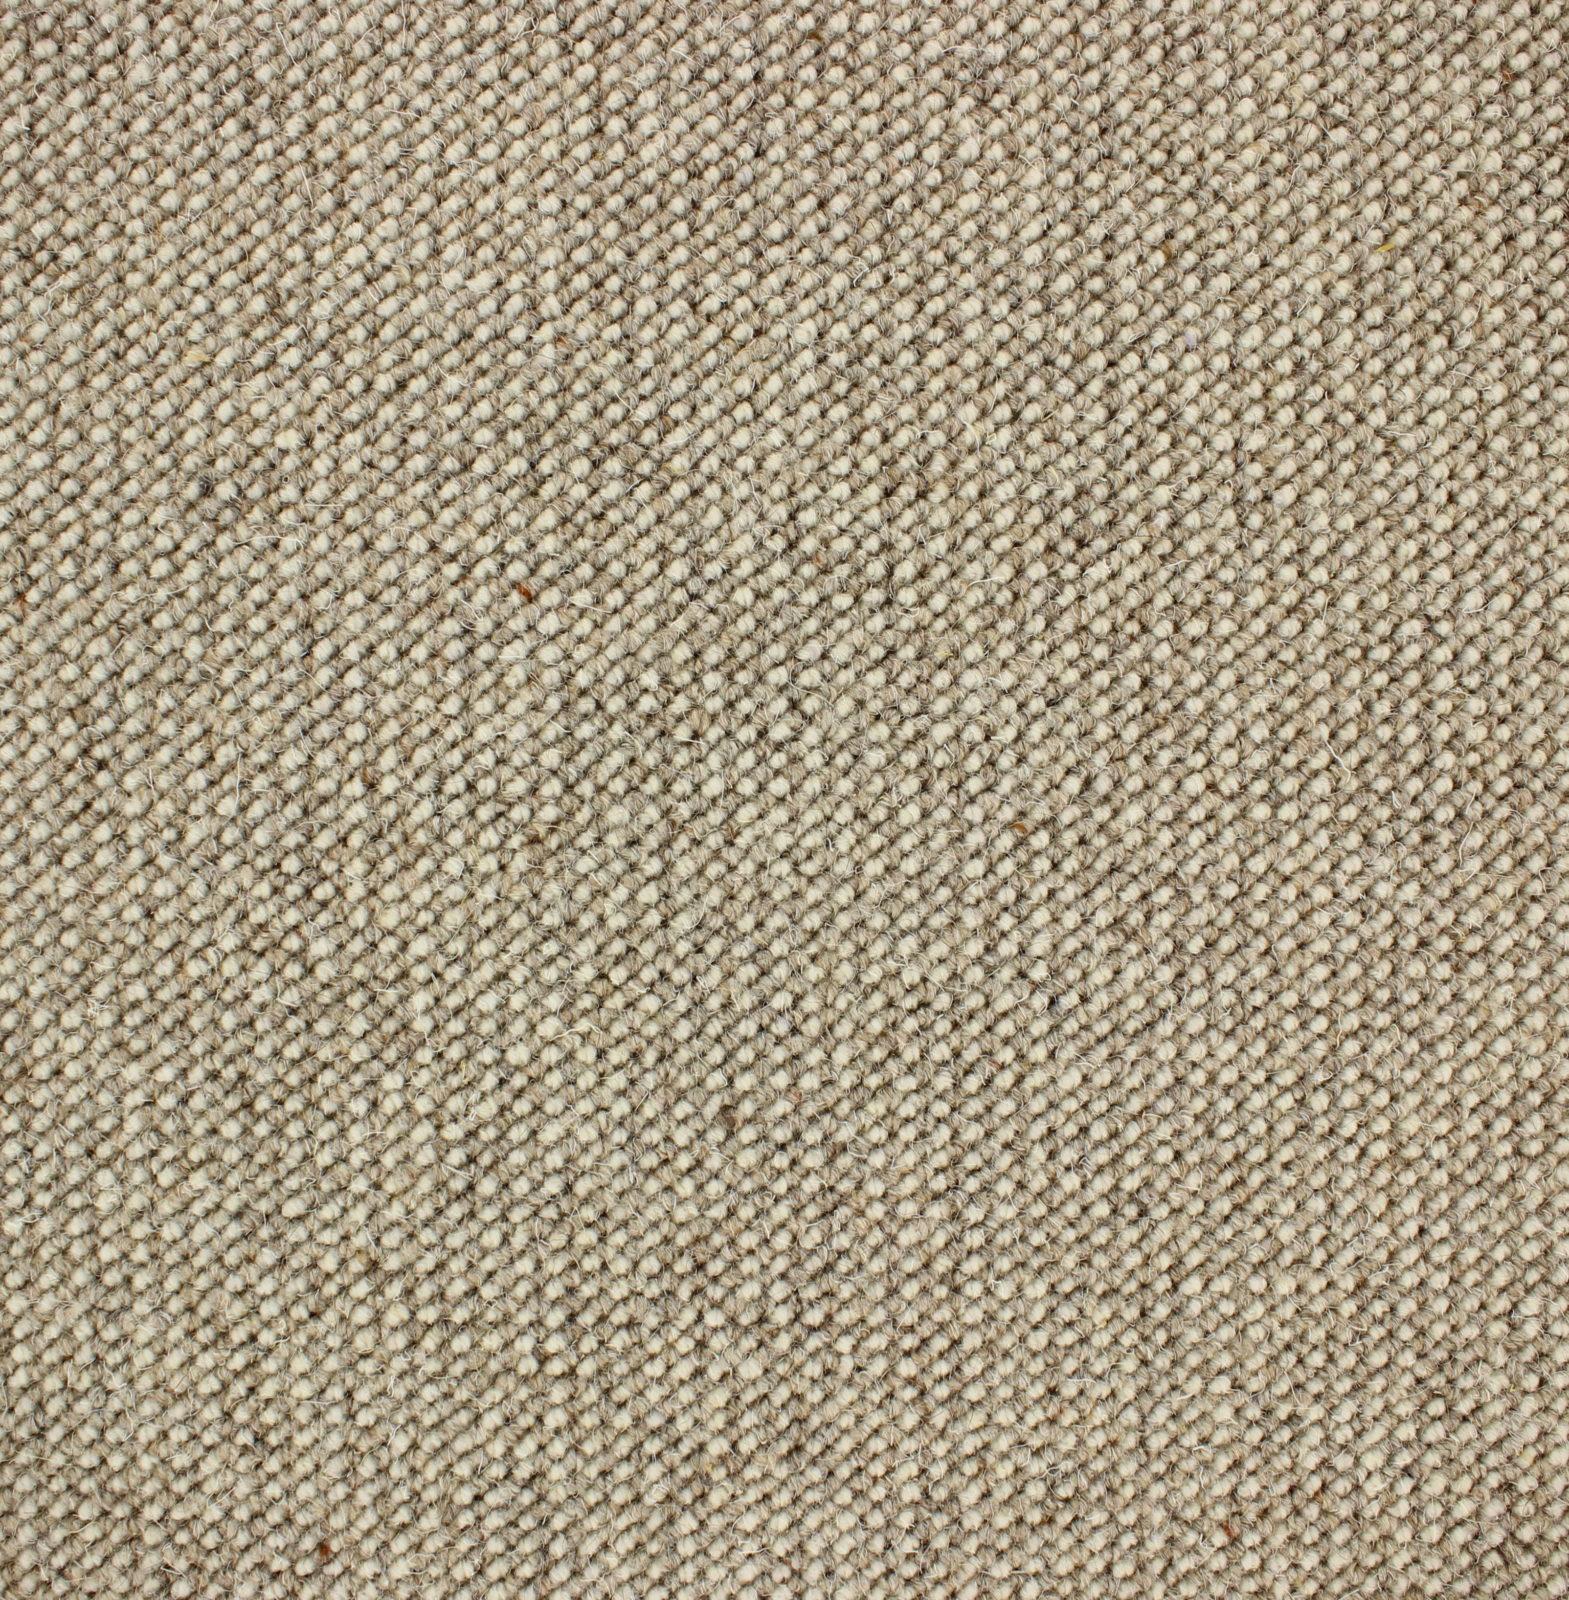 carpet_sample